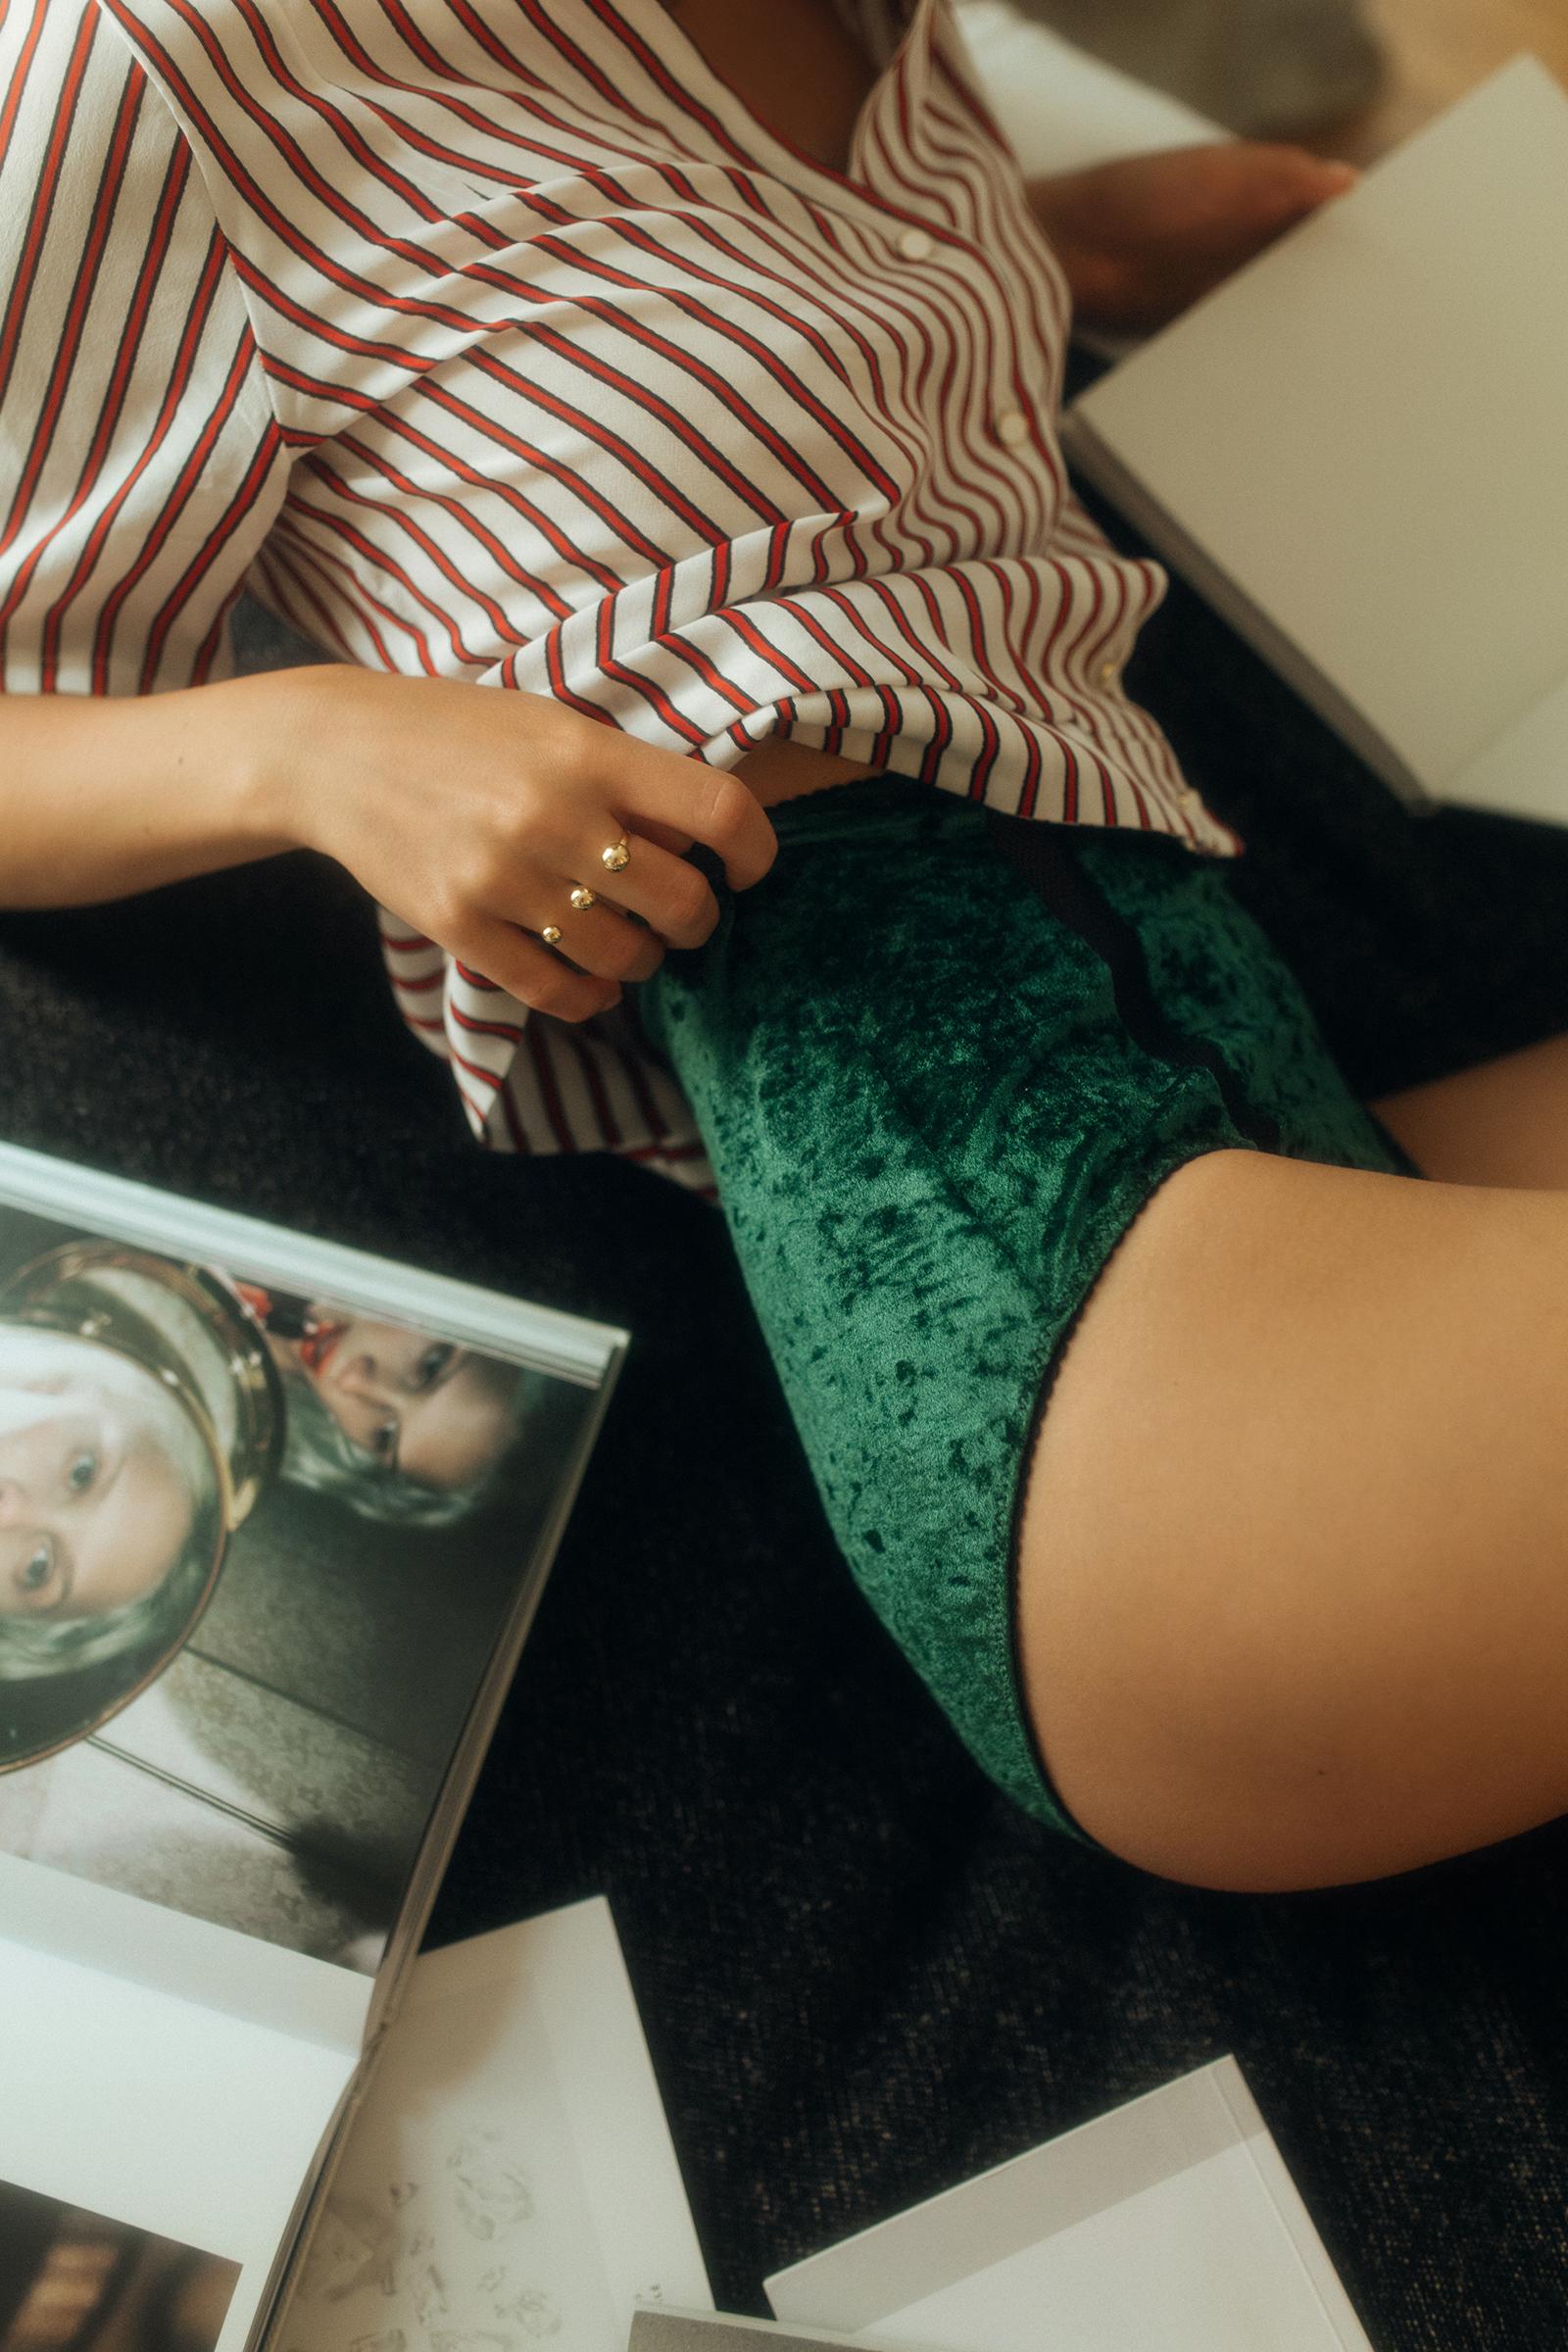 editorial_Yasmine-Ravel_anne-charlotte-moreau_03